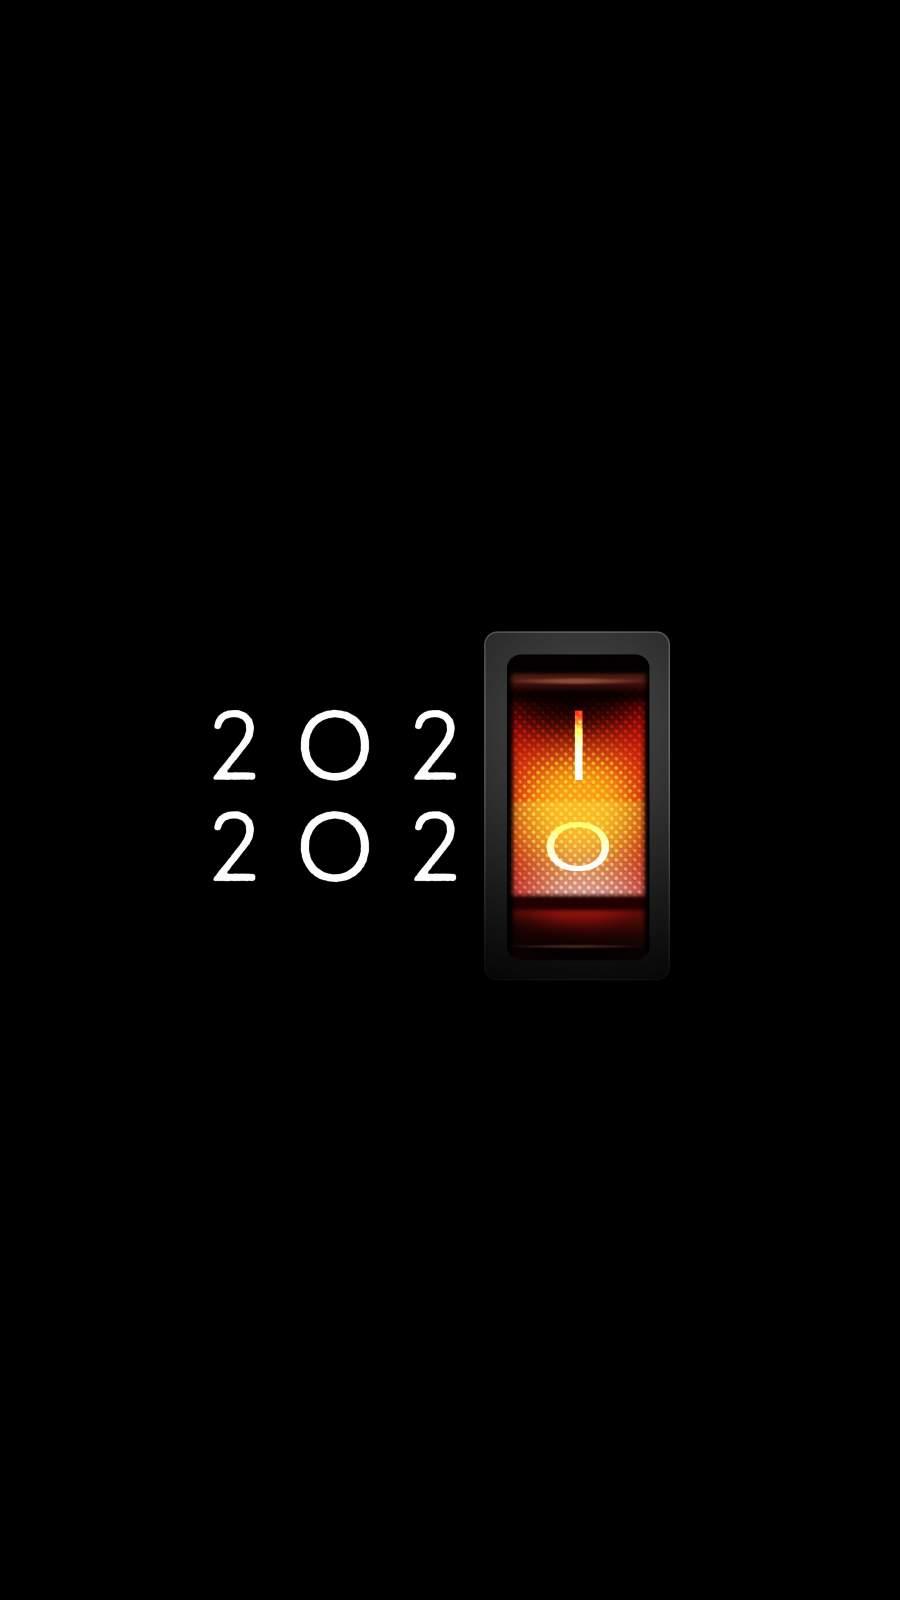 2021 iPhone Wallpaper